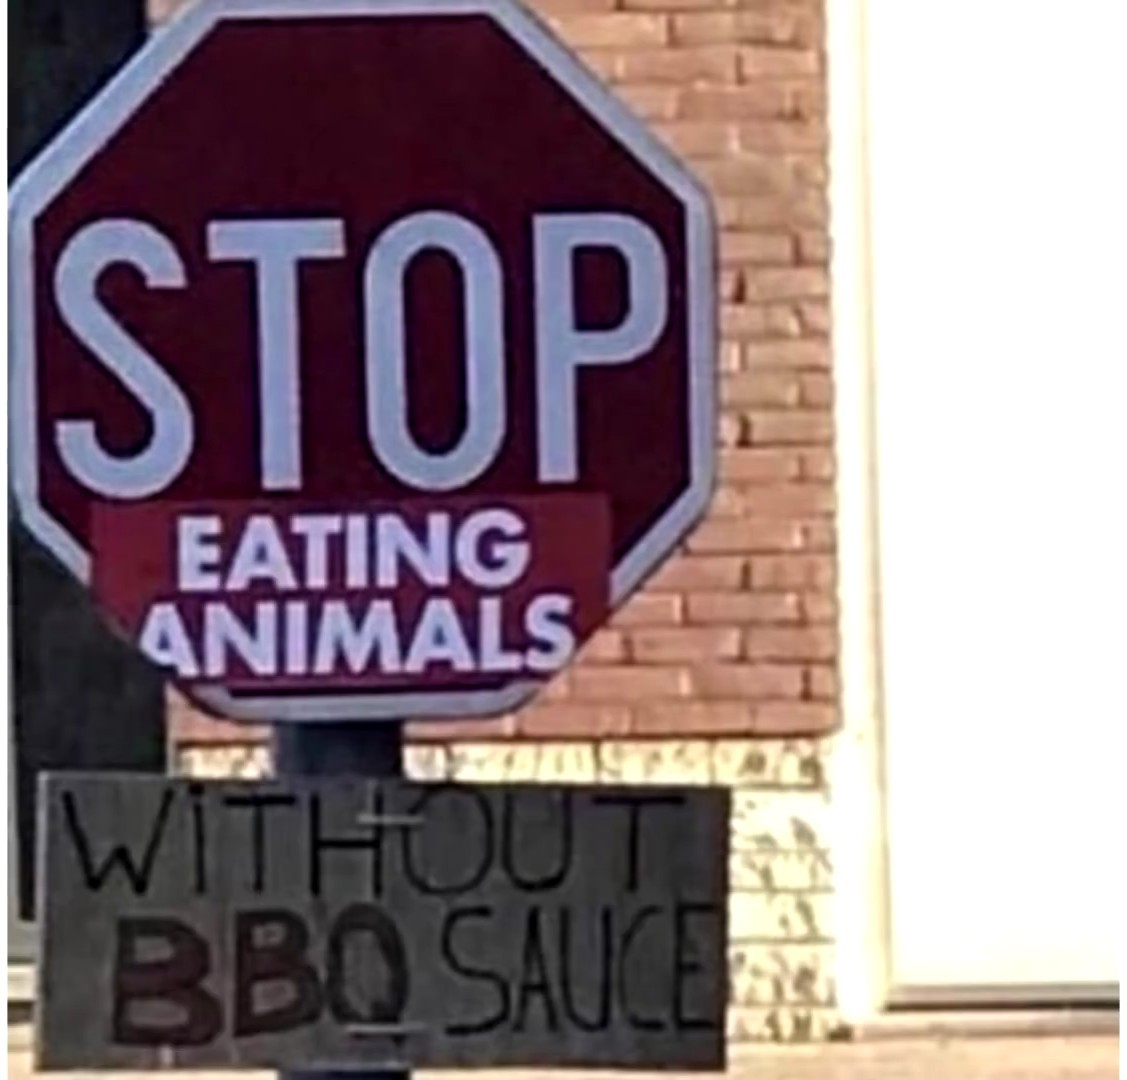 Misleading sign - meme